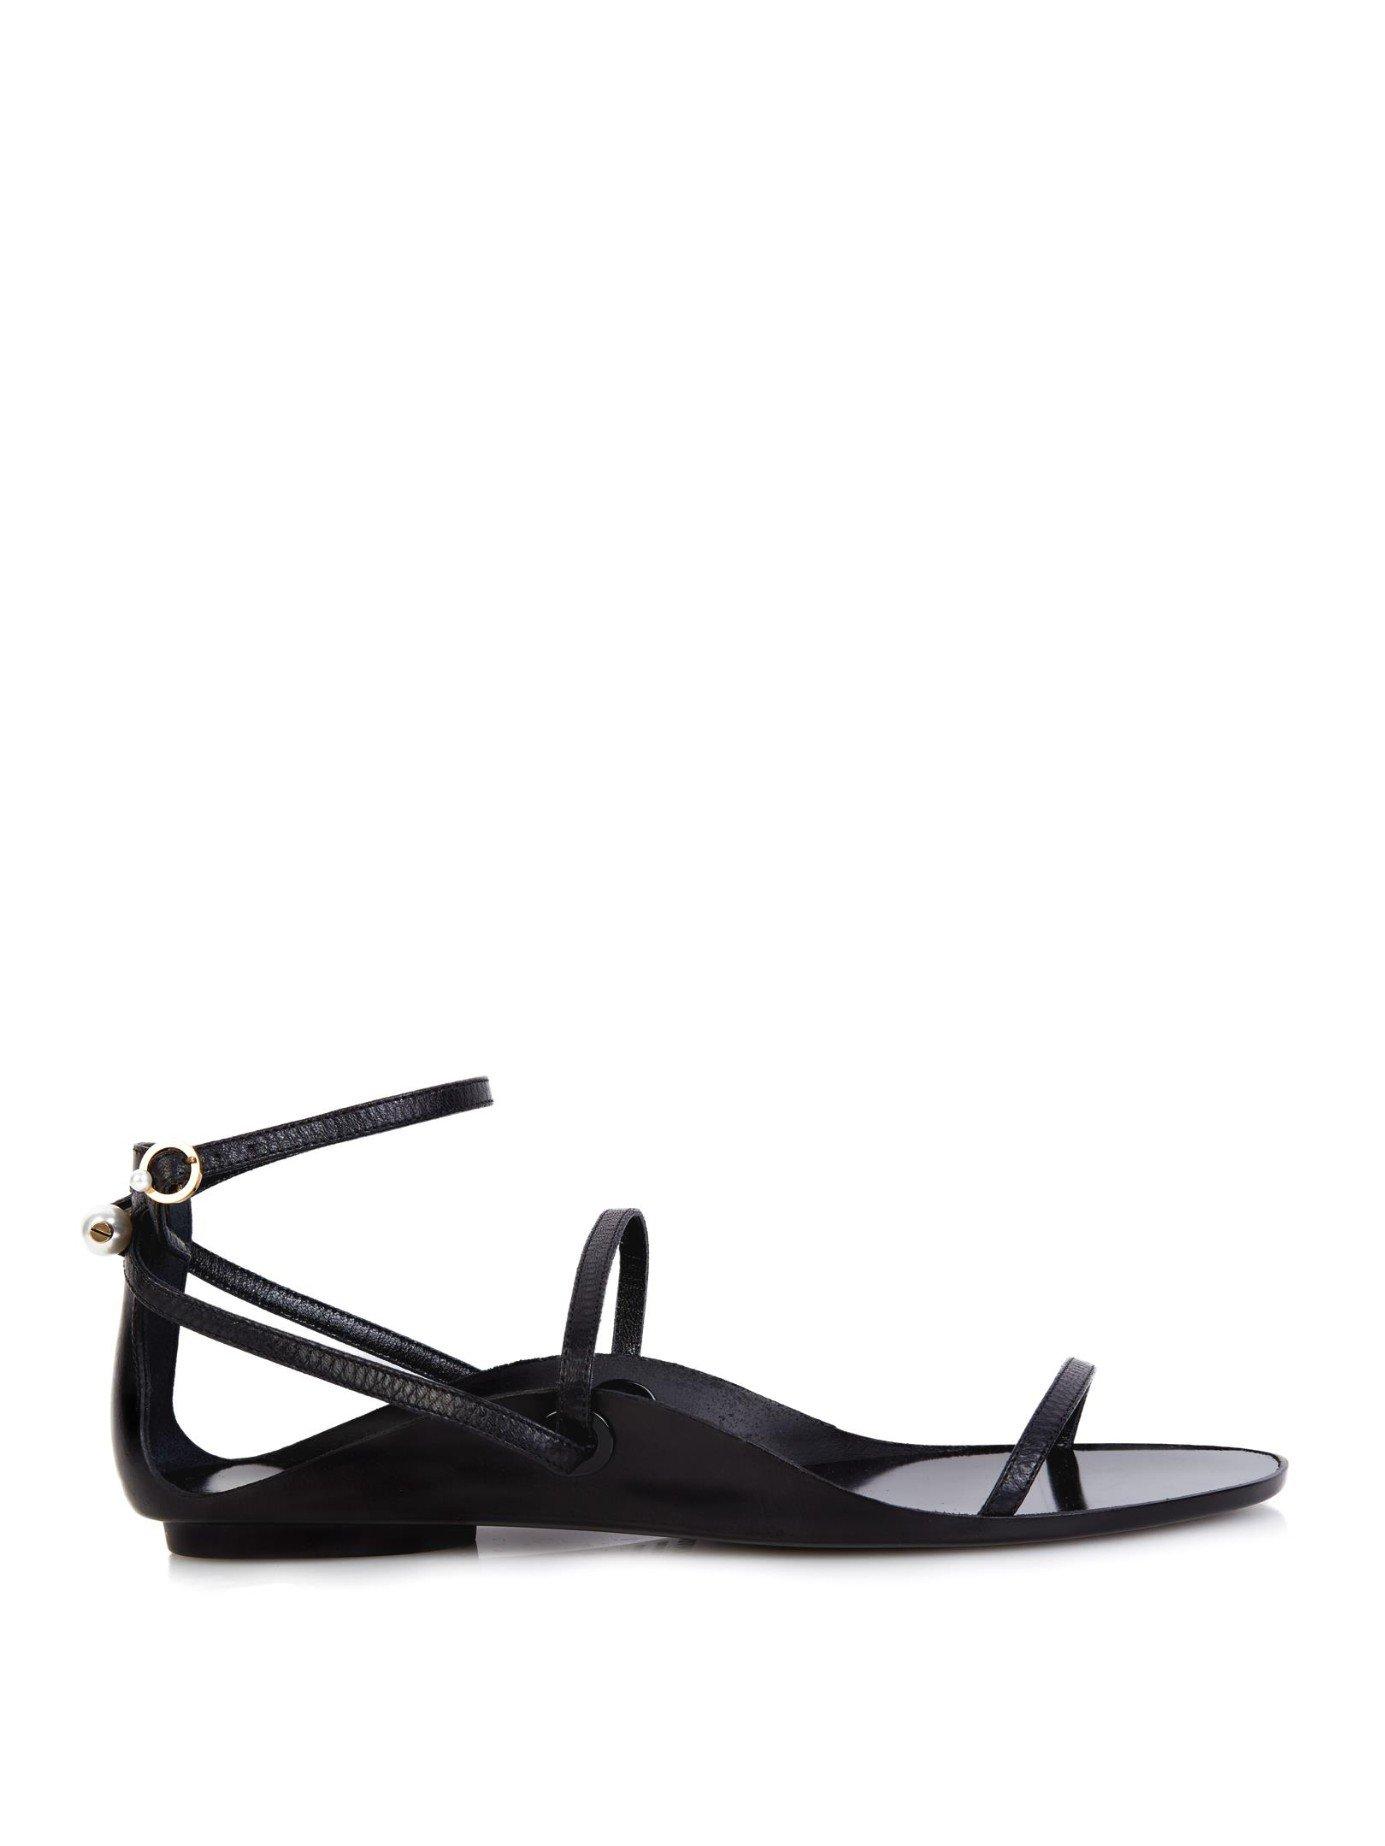 Lanvin Pearl Slippers